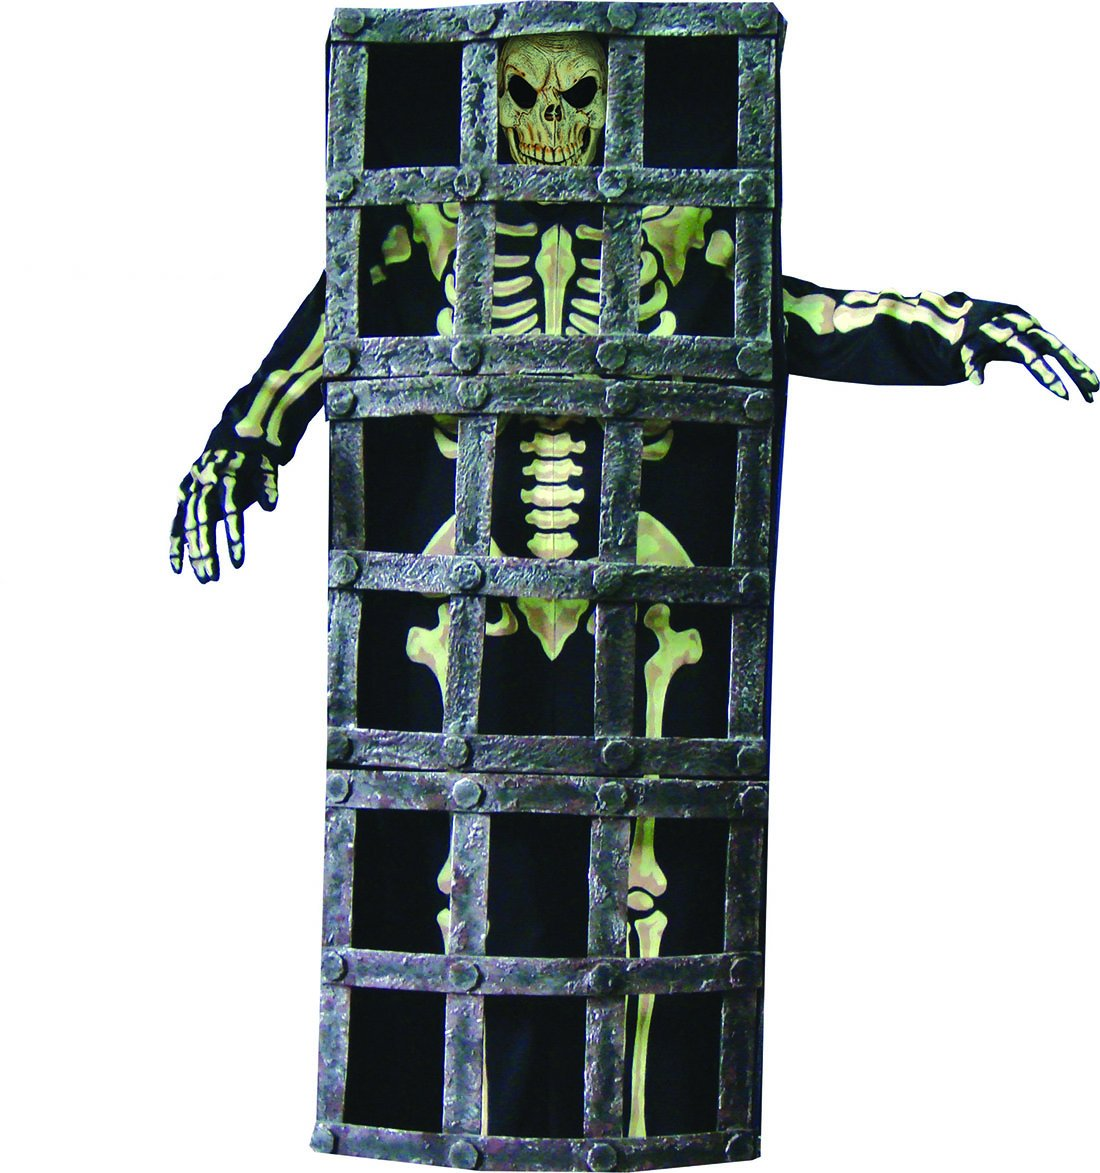 Erdbeerclown - Herren Halloween Karnevals-Kostüm Set Nightmare Horror Gefängnis-Skelett, One Größe, Mehrfarbig